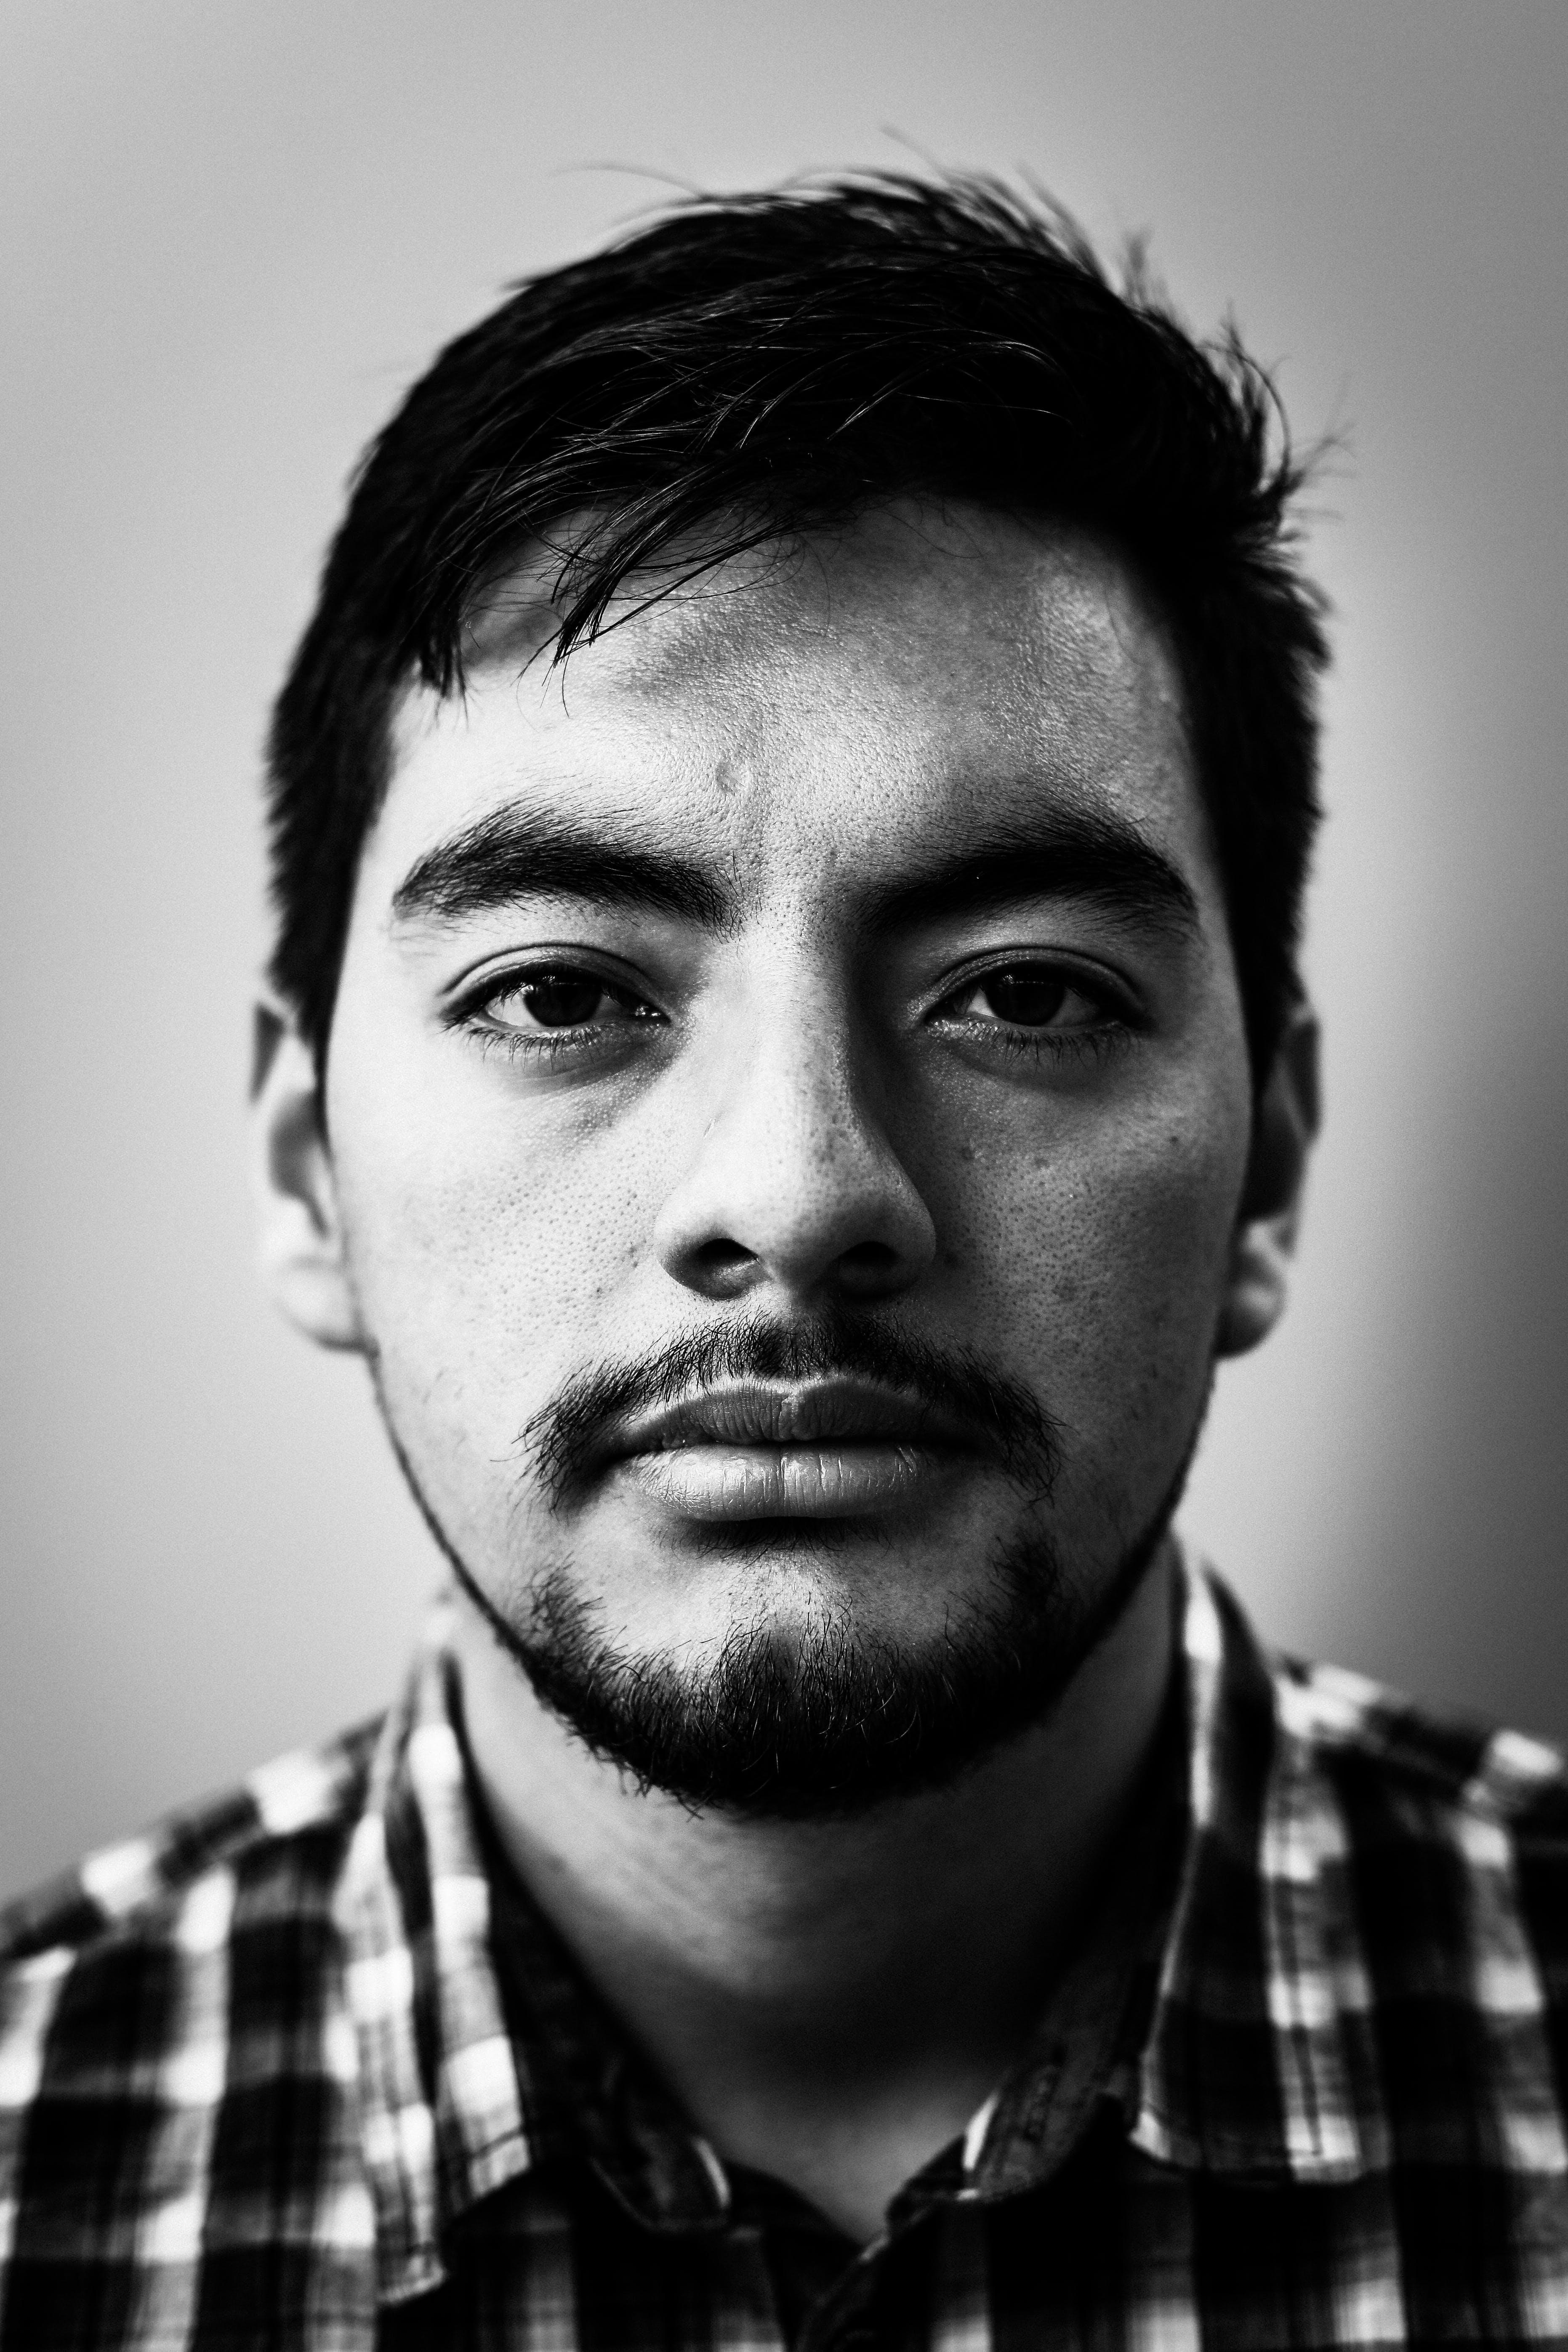 Free stock photo of people, men, face, portrait